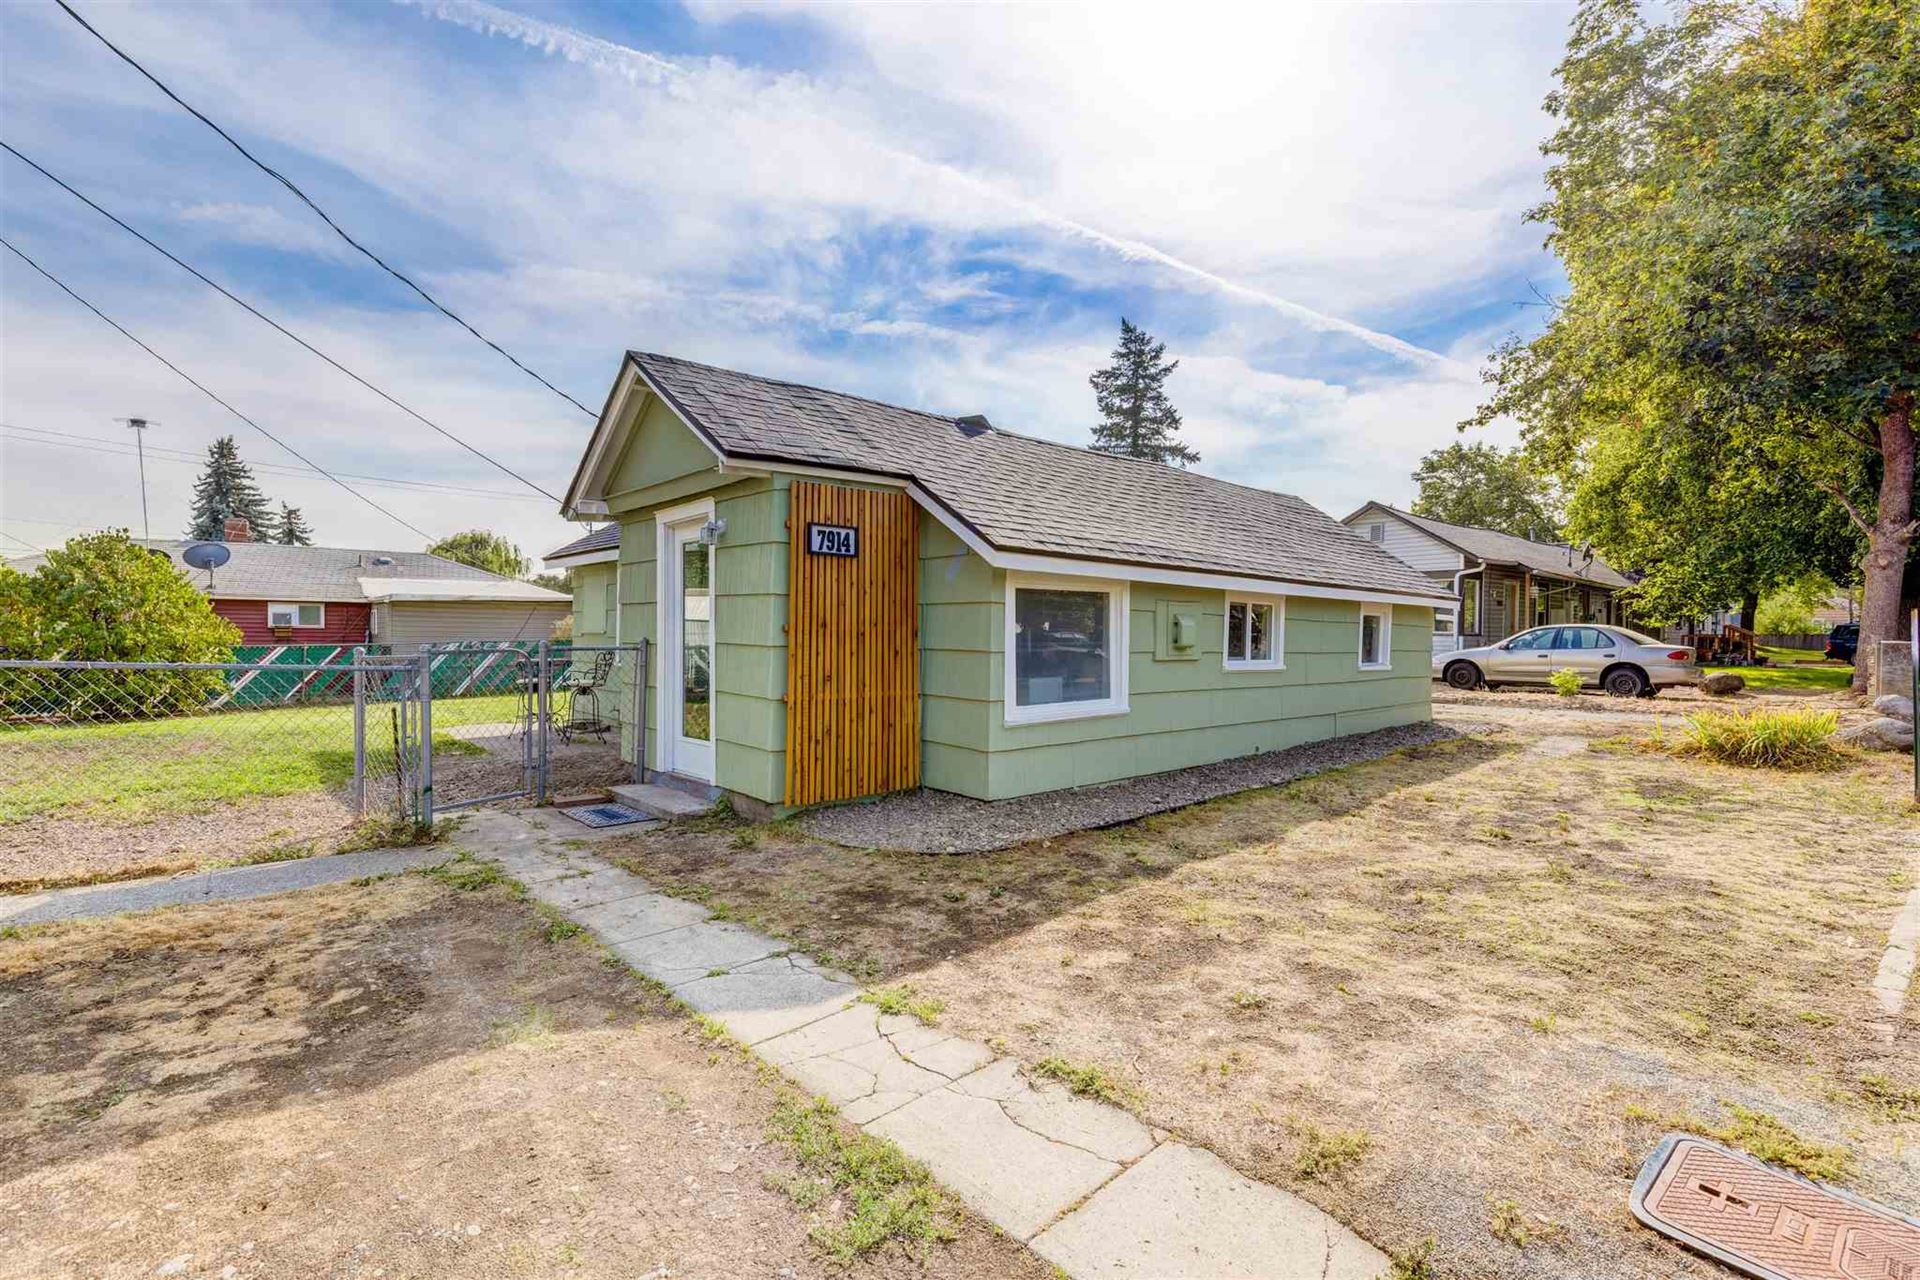 7914 E Euclid Ave, Spokane, WA 99212 - #: 202121940